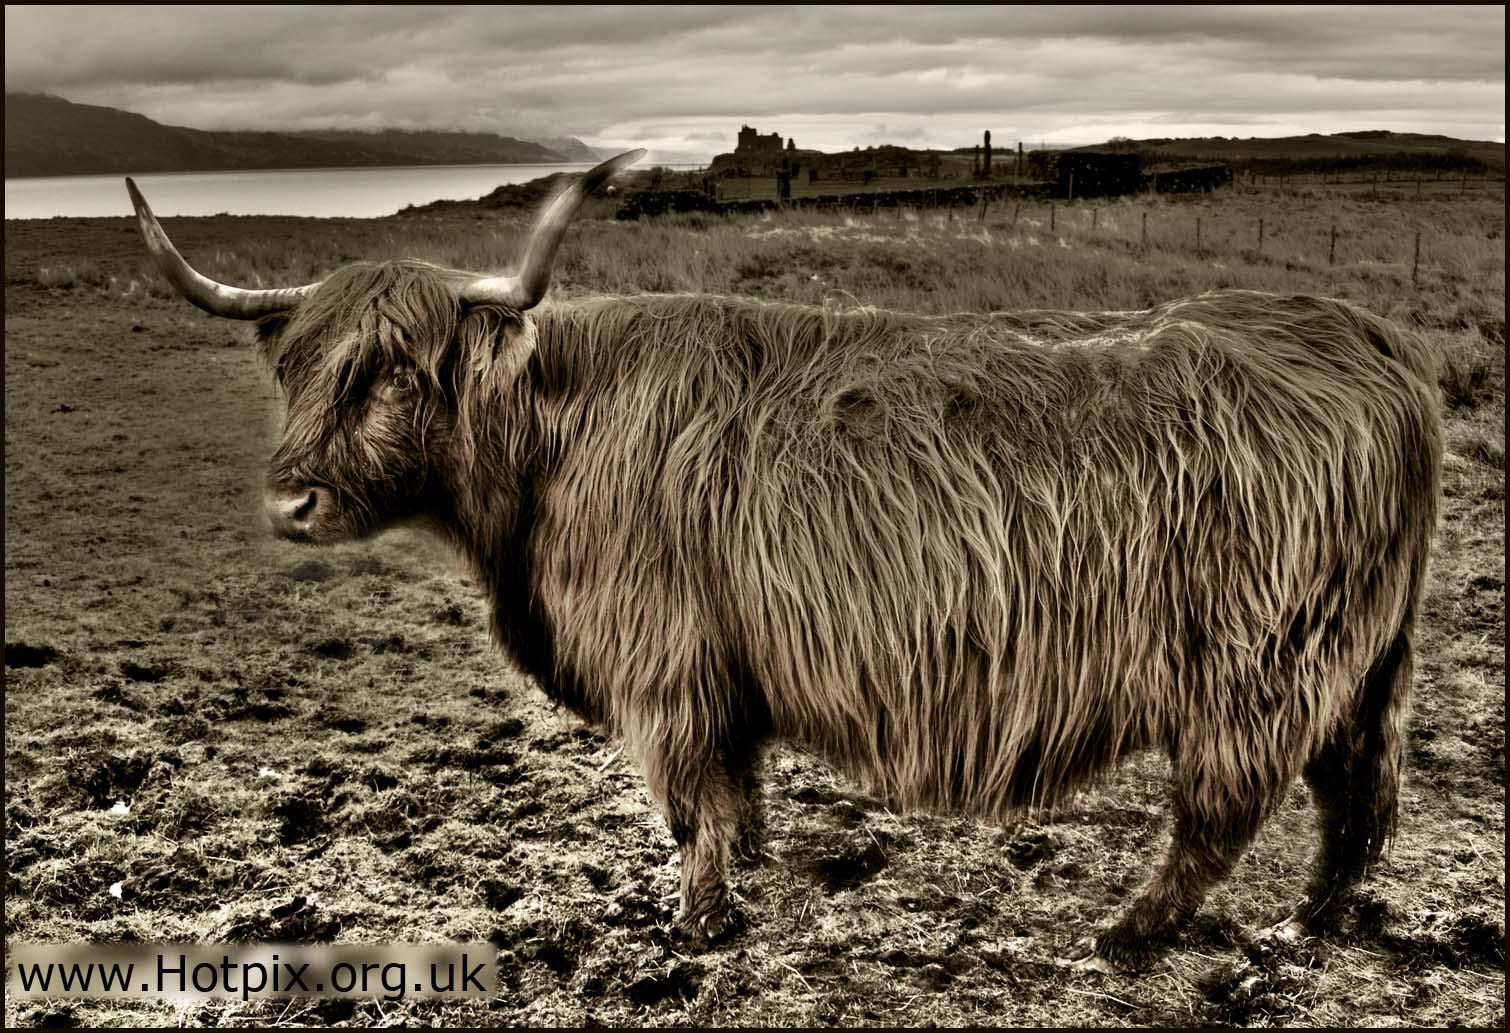 cow,highland,cattle,mull,isle,inner,islands,scotland,UK,ferry cow,ferry,calmac,calledonian,macbrayne,hair,hairy,hotpix,hotpixuk,tonysmith,tony,smith,scot,scottish,heritage,fild,farm,agriculture,HDR,narrative,edinbrugh,#tonysmithhotpix